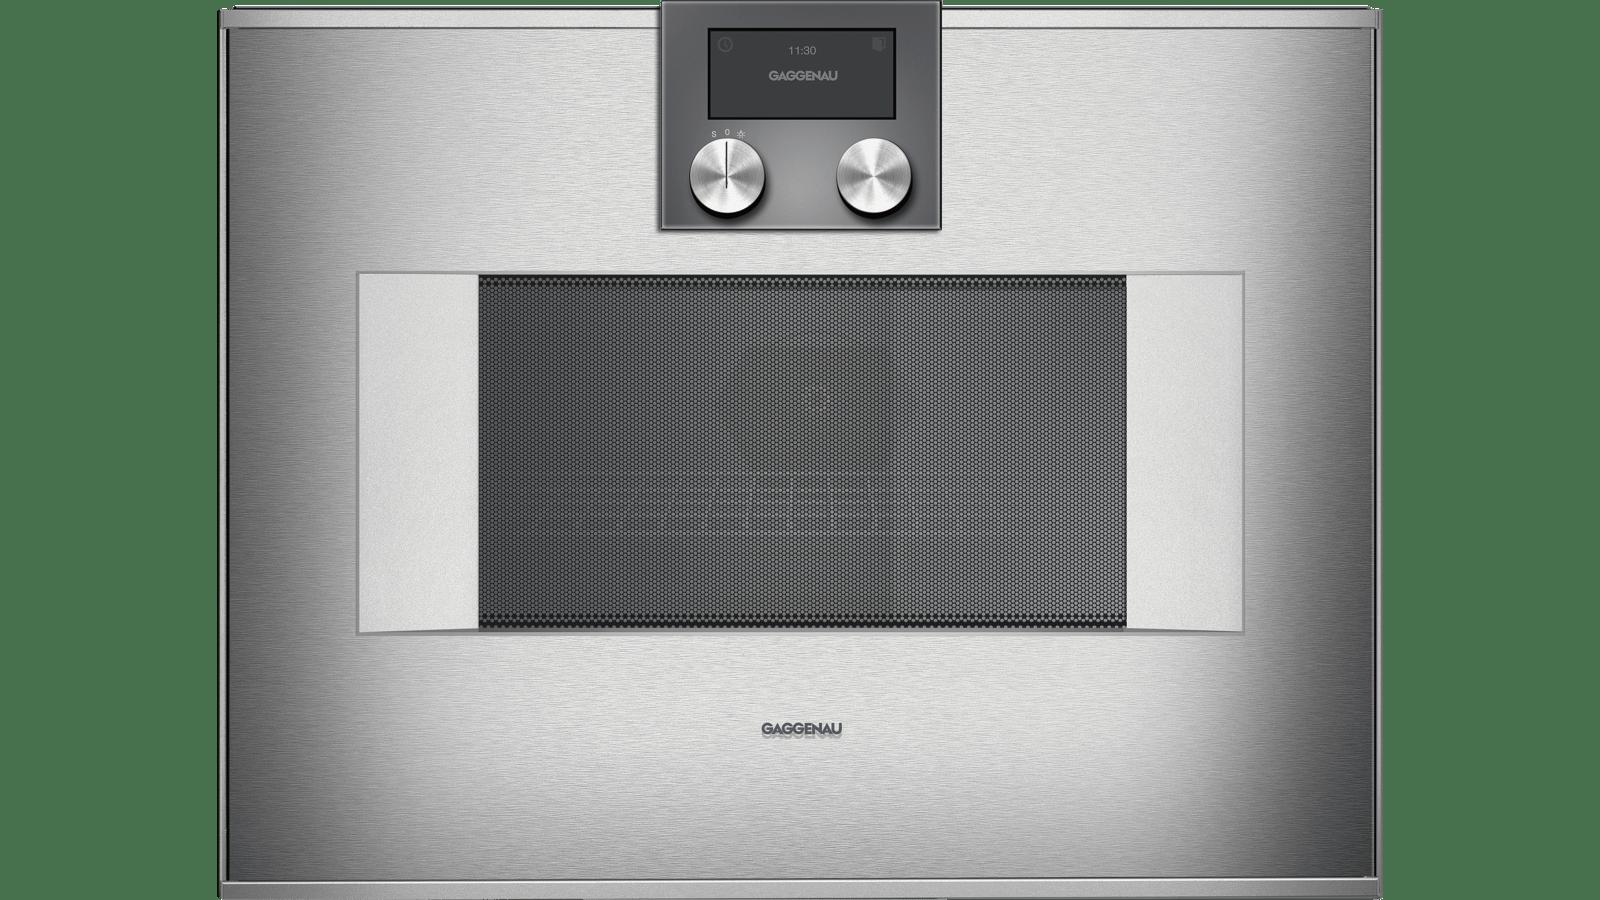 Gaggenau Bm451710 Combi Microwave Oven